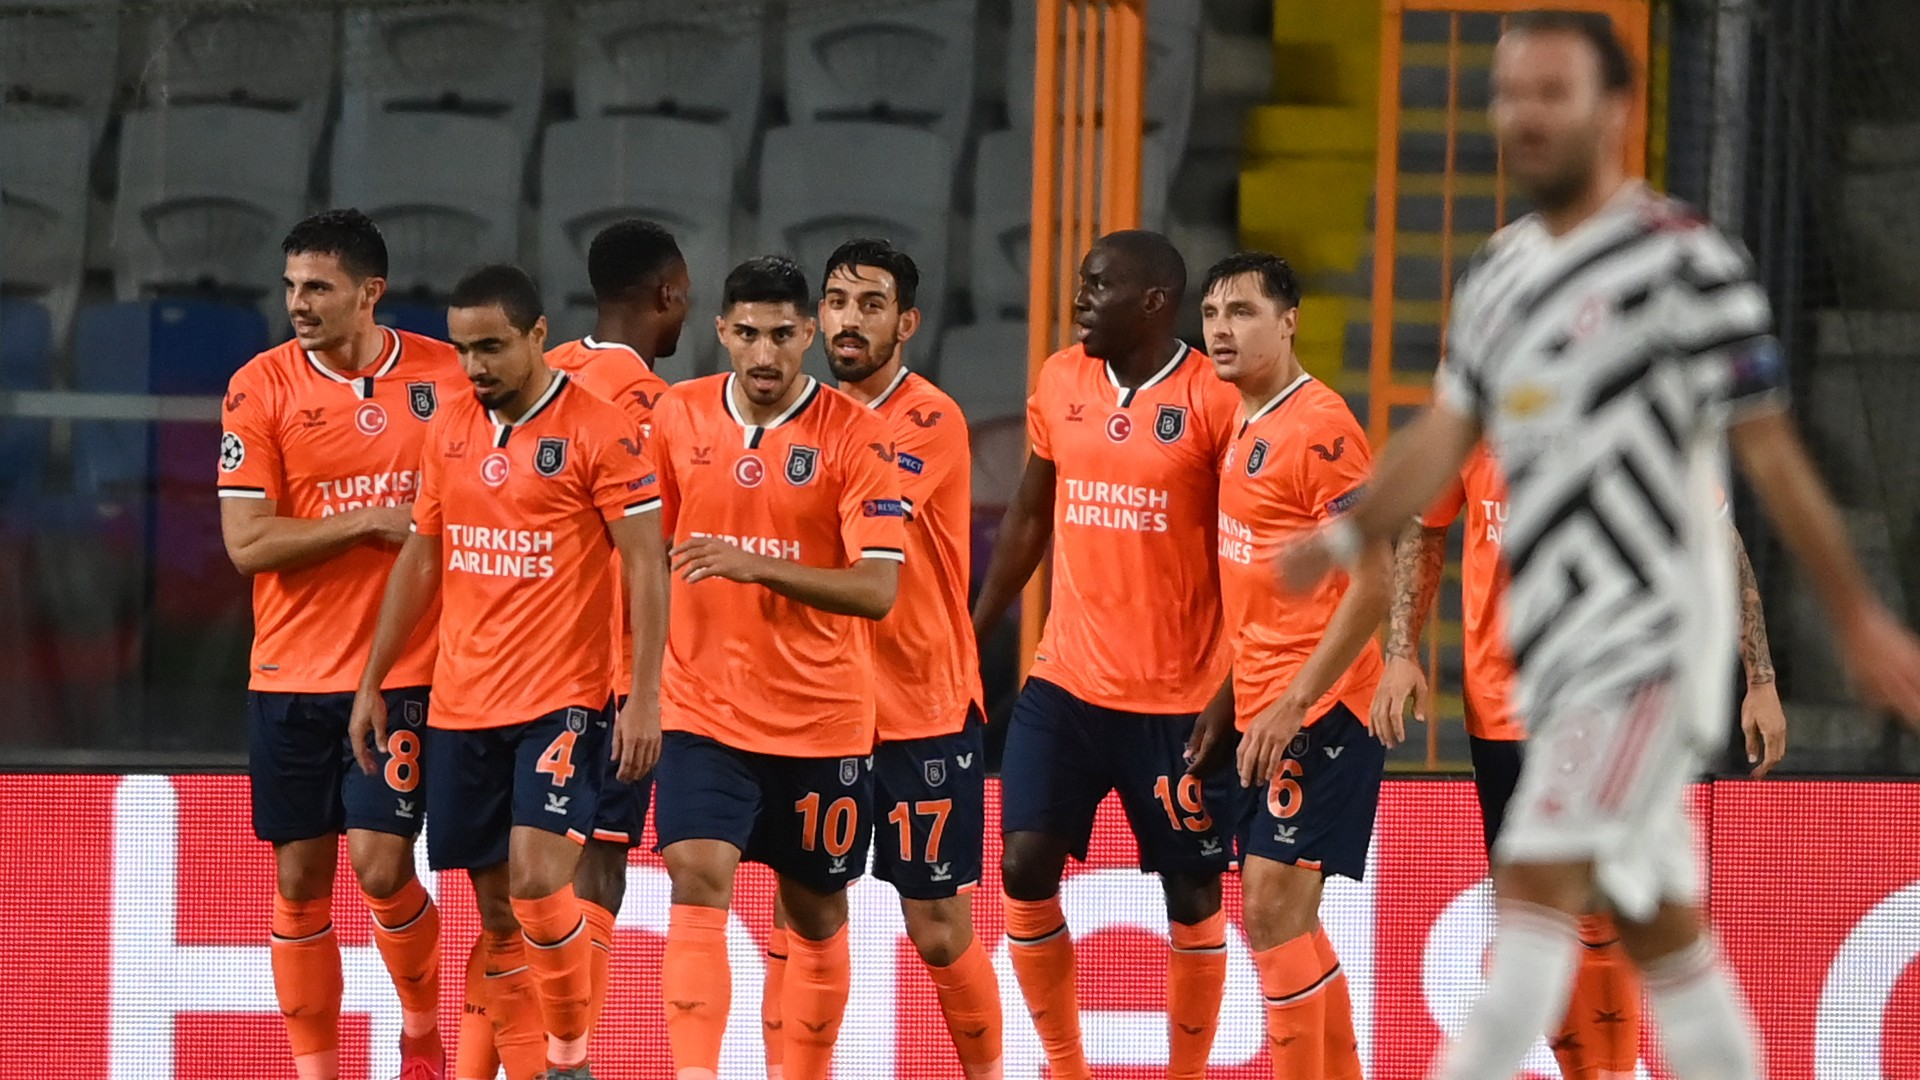 Laporan Pertandingan Istanbul Basaksehir 2 1 Manchester United Goal Com